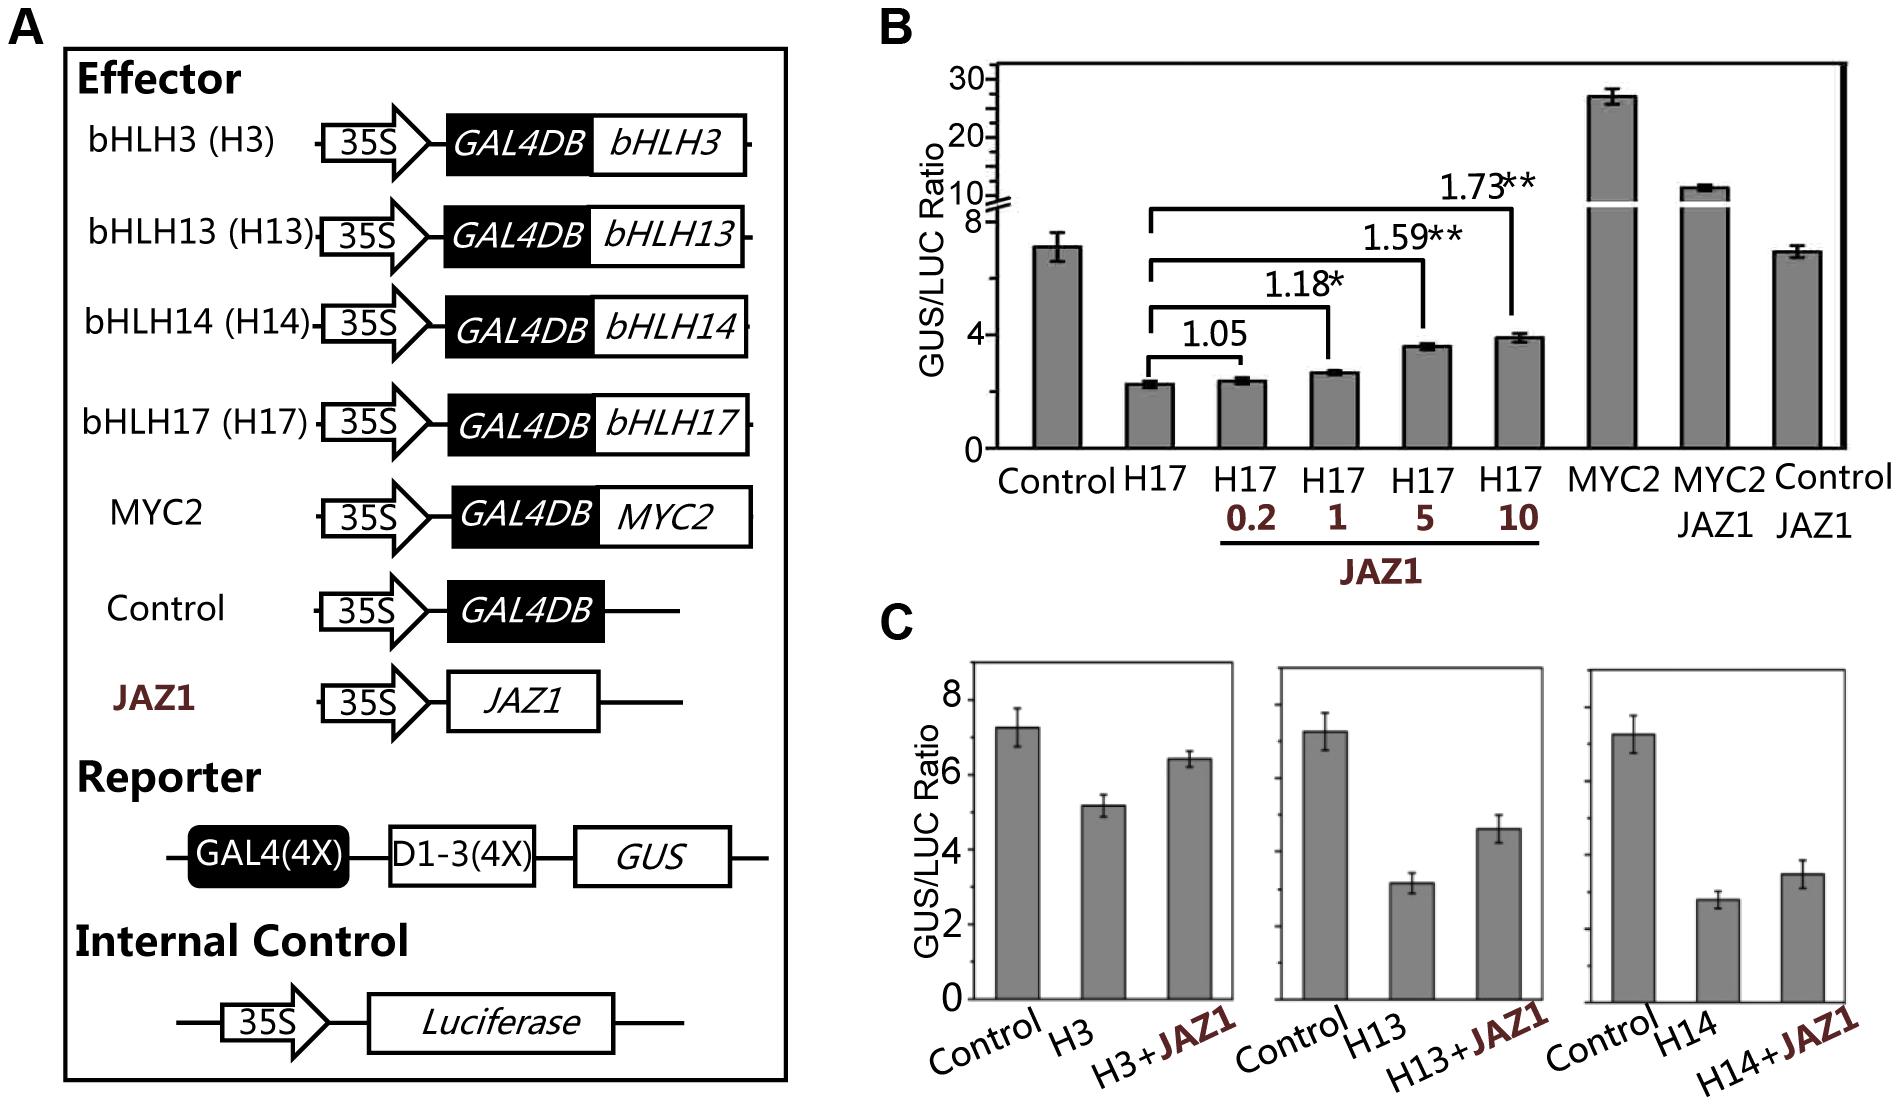 bHLH3, bHLH13, bHLH14 and bHLH17 act as transcription repressors.